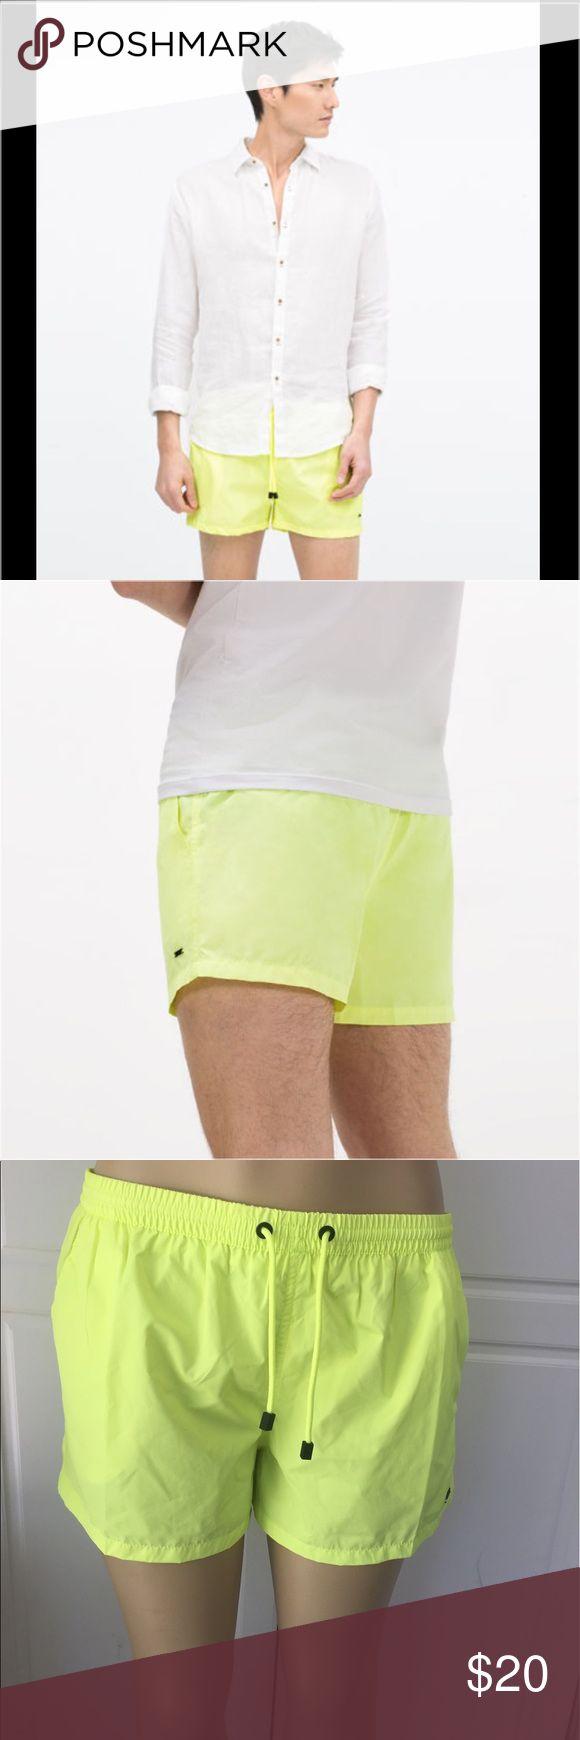 250 Best My Posh Picks Images On Pinterest Block Heel Shoes Acrylick Online Men39s Short Circuit Tshirt Zara Men Shorts